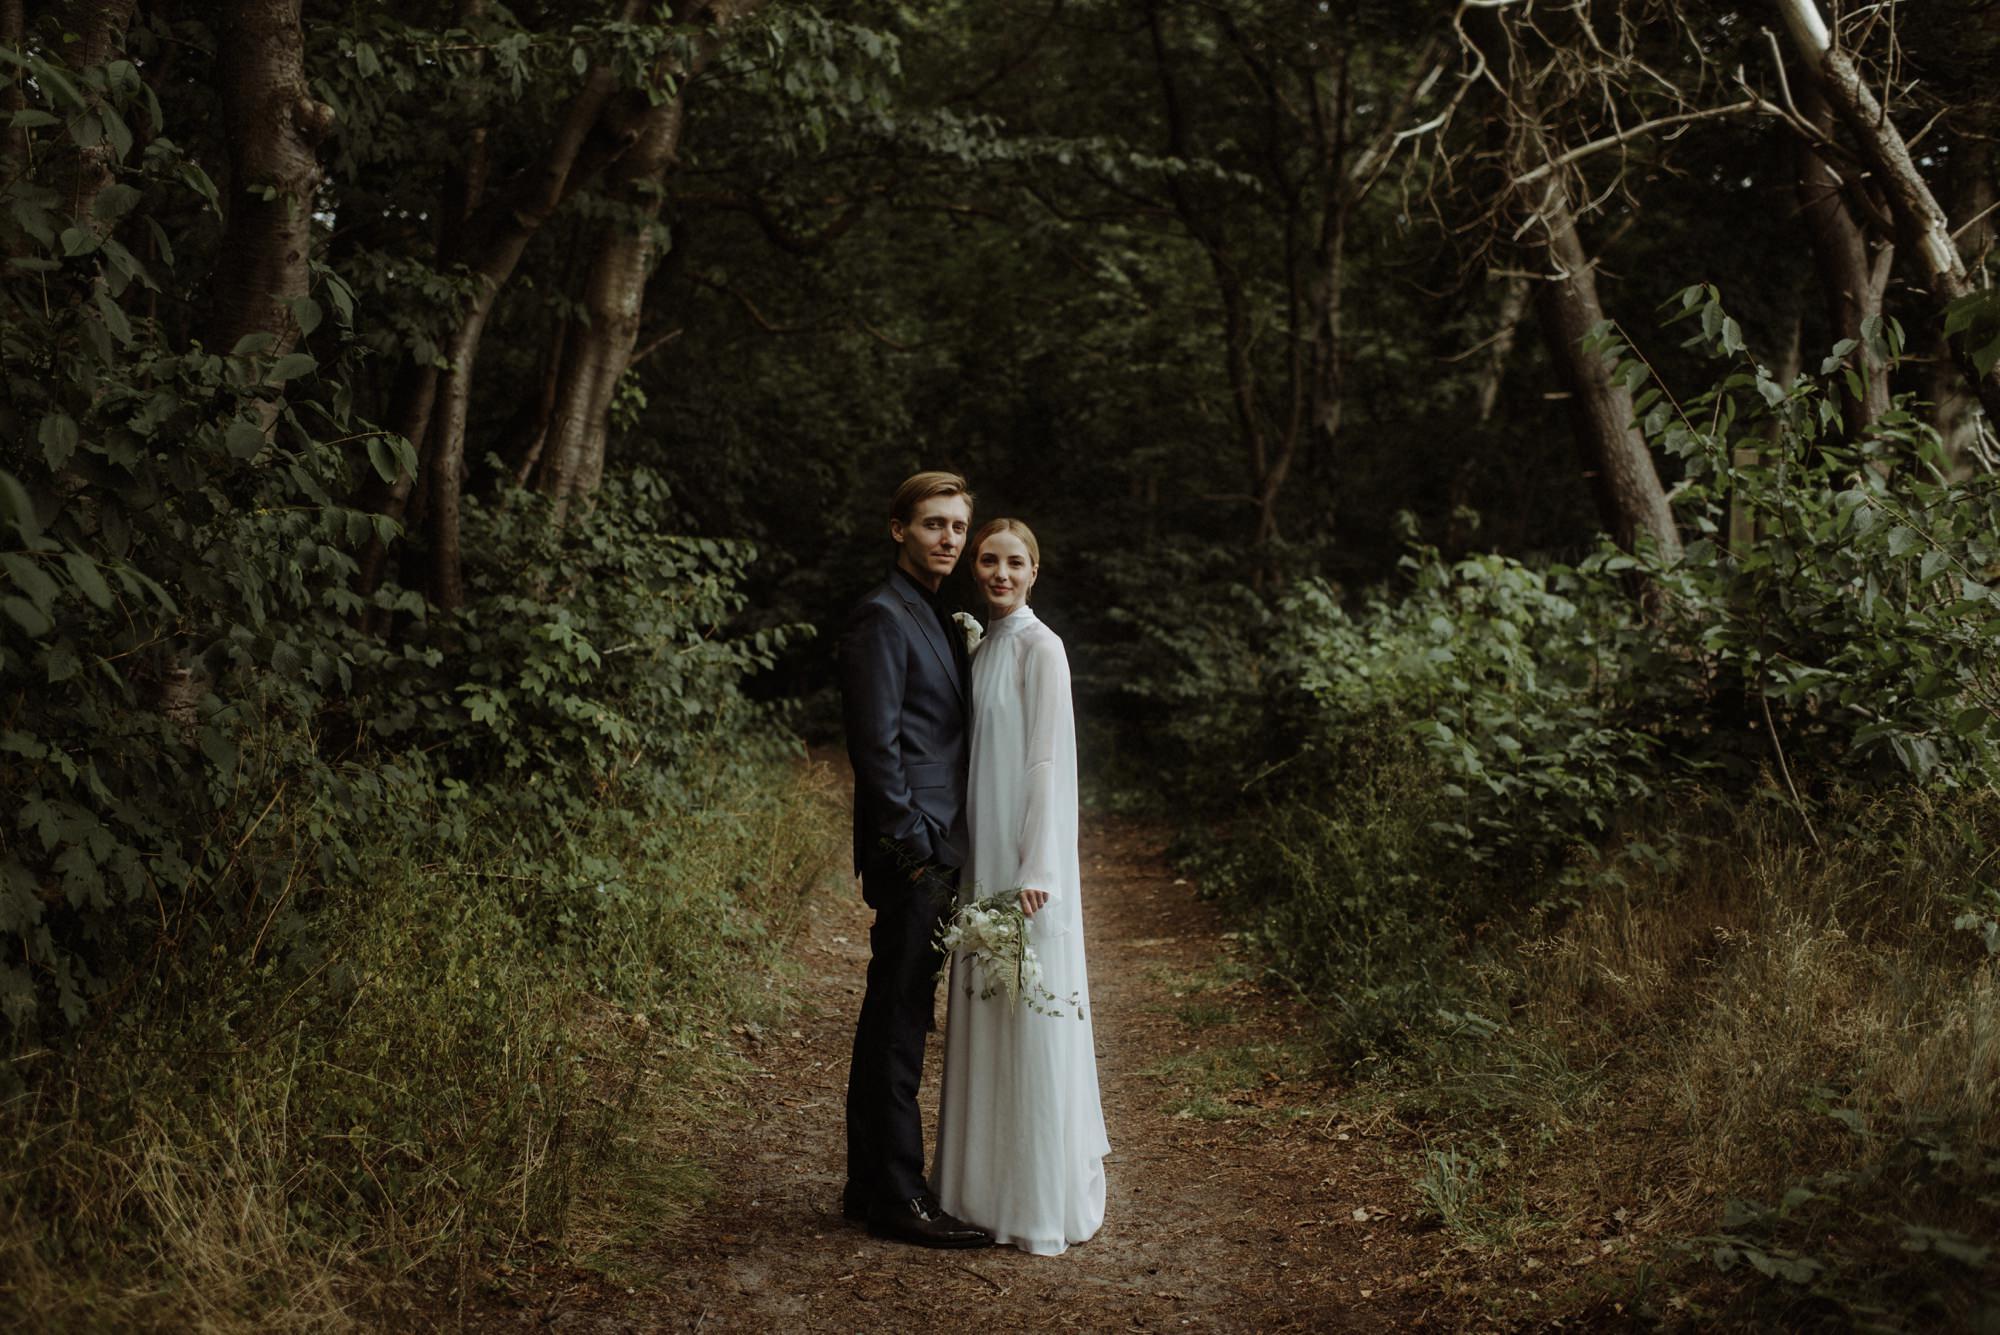 copenhagen wedding photography 0027 1